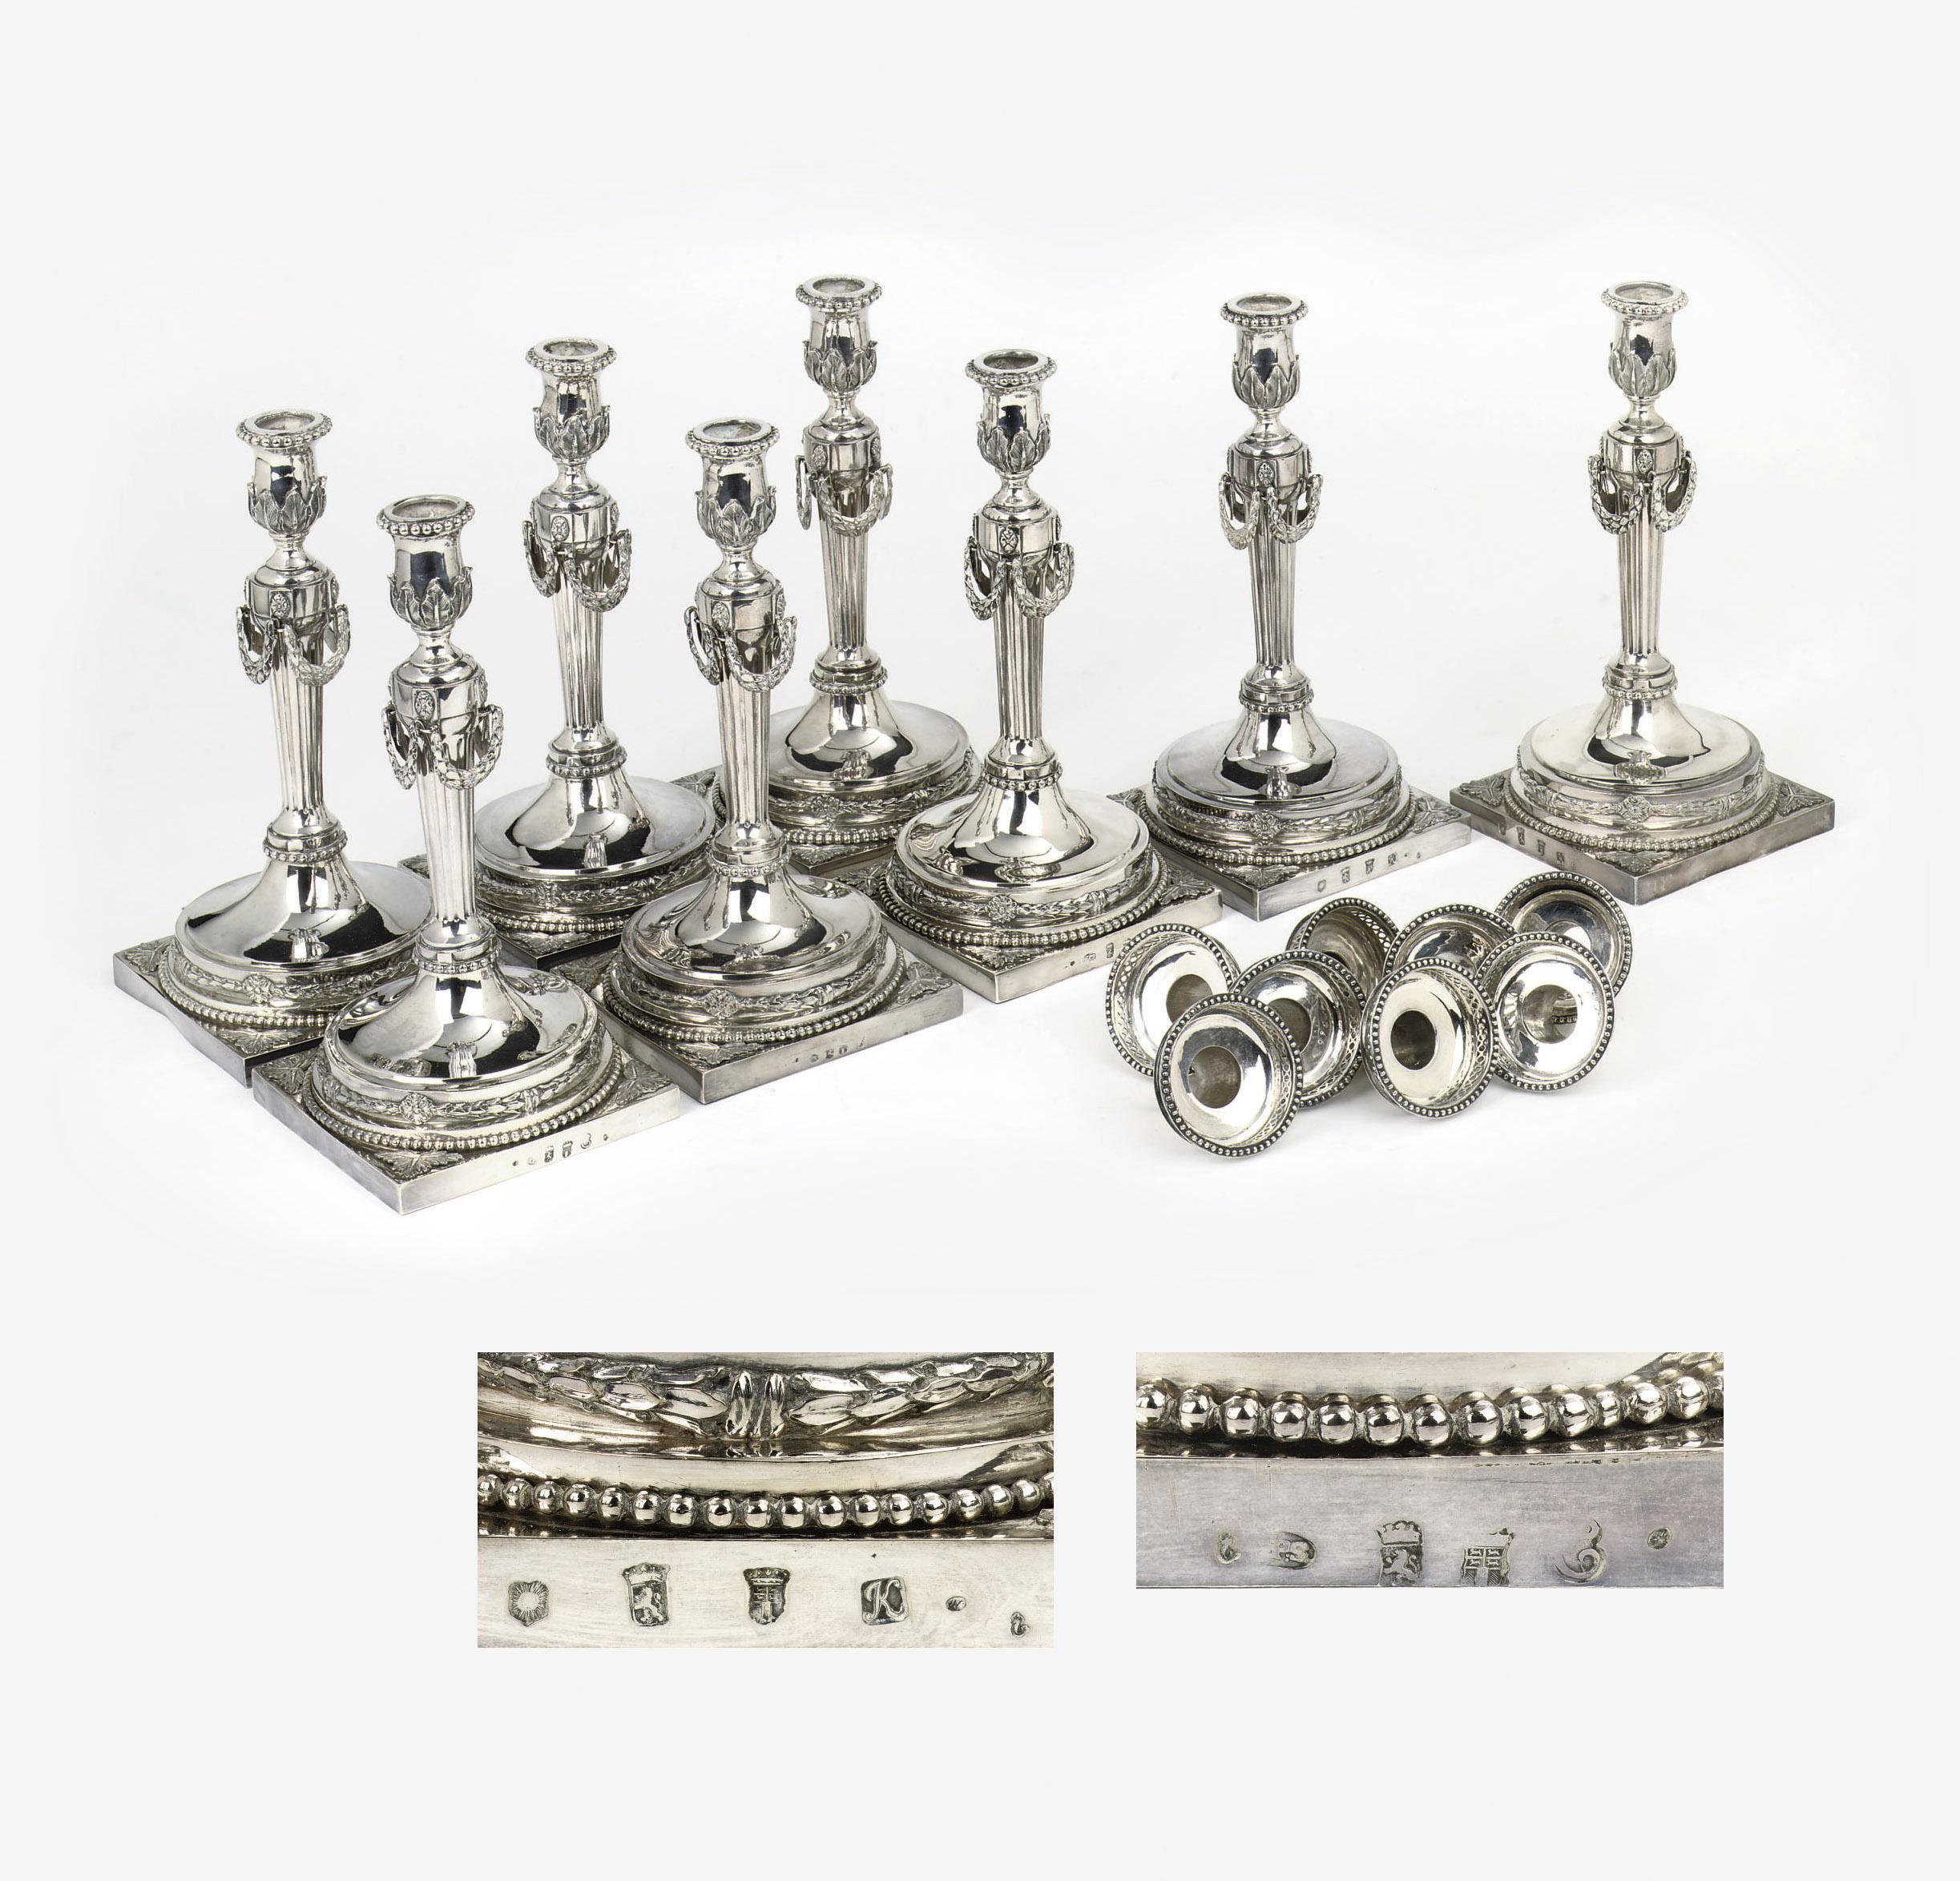 A matched set of eight Dutch silver candlesticks